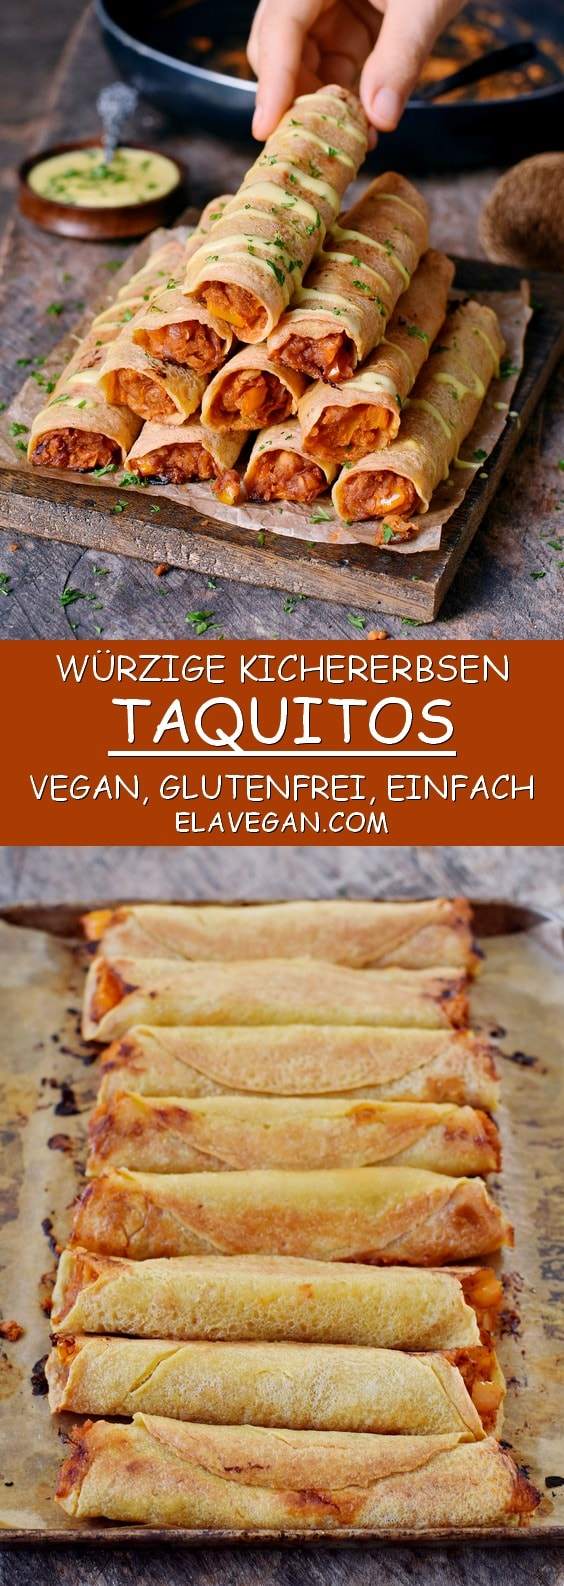 kichererbsen taquitos vegan glutenfrei einfaches rezept